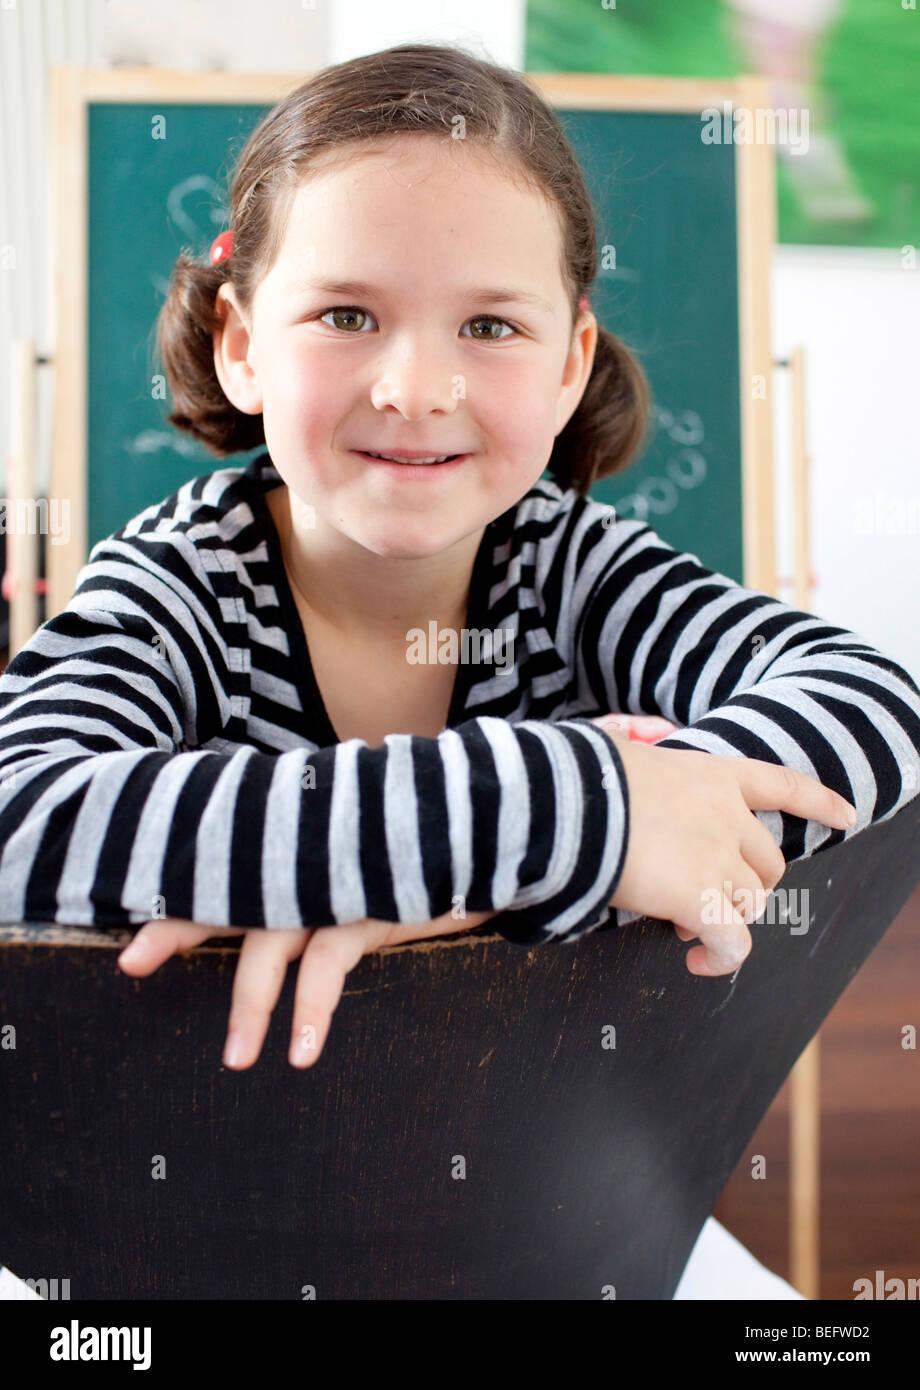 School-age child - Stock Image